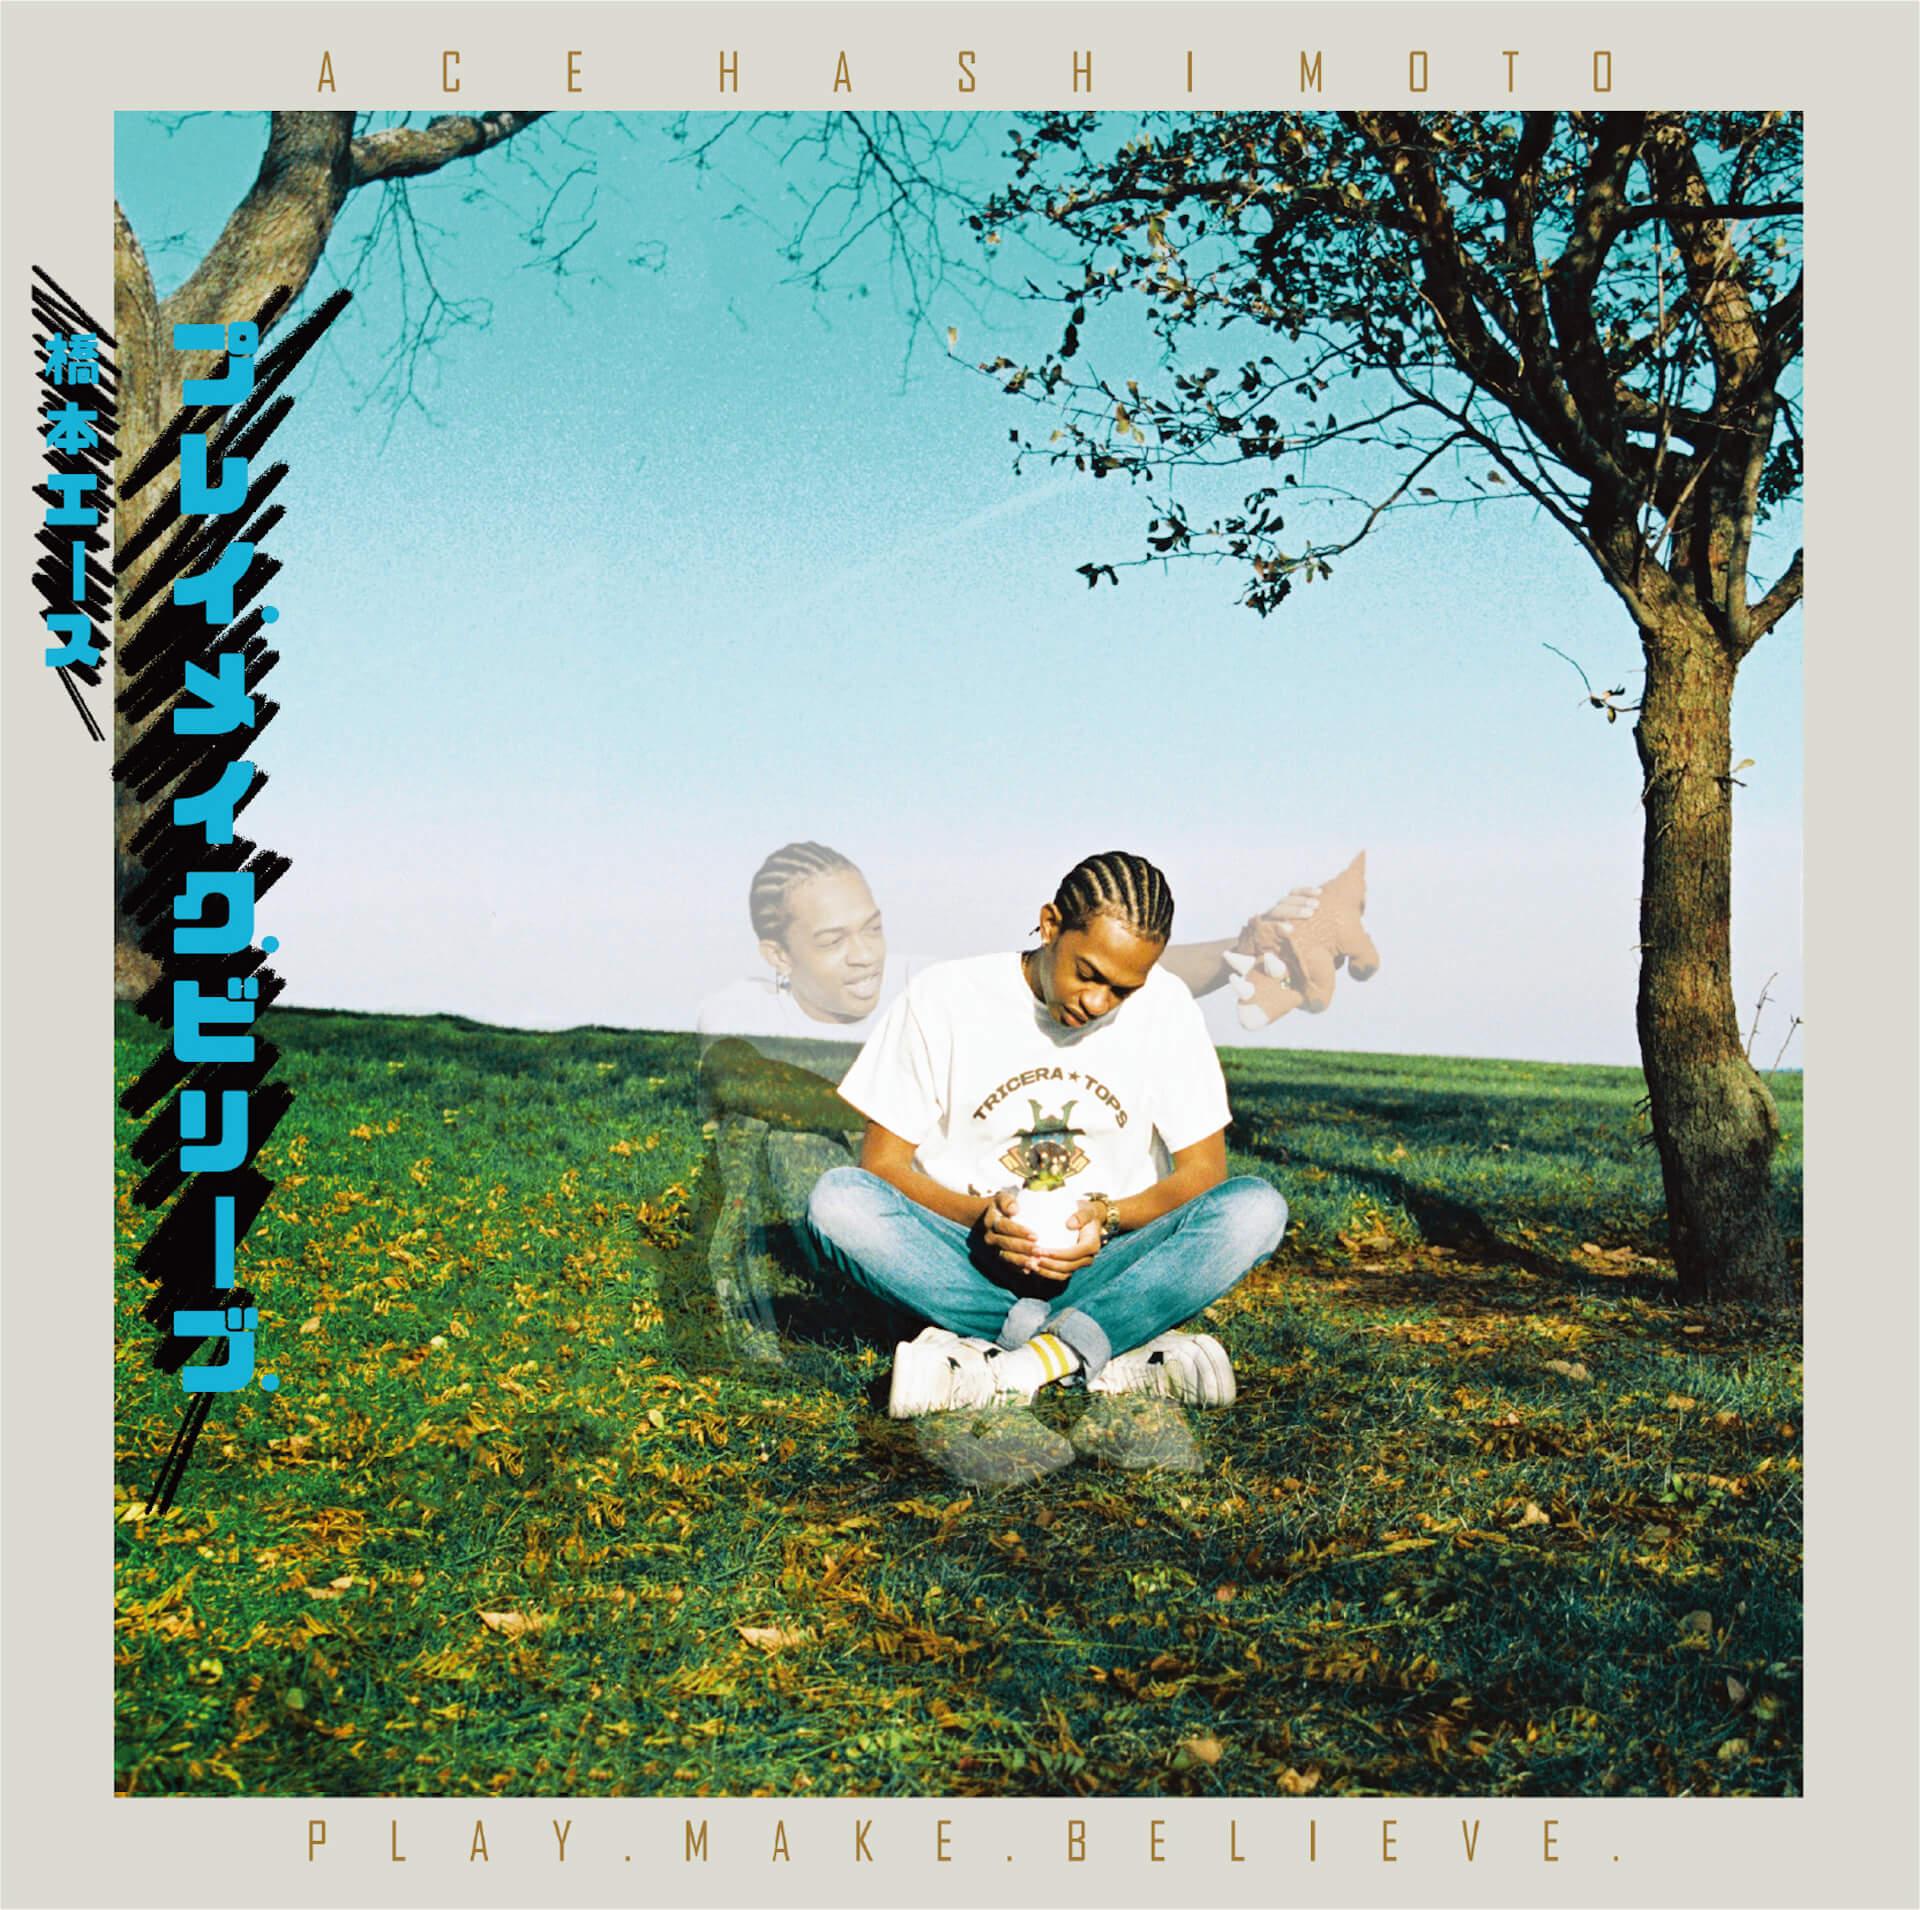 Odd Future初期メンバー・エース橋本のアルバム『Play.Make.Believe』がリリース決定|向井太一、5lackも参加 music210412_acehashimoto_2